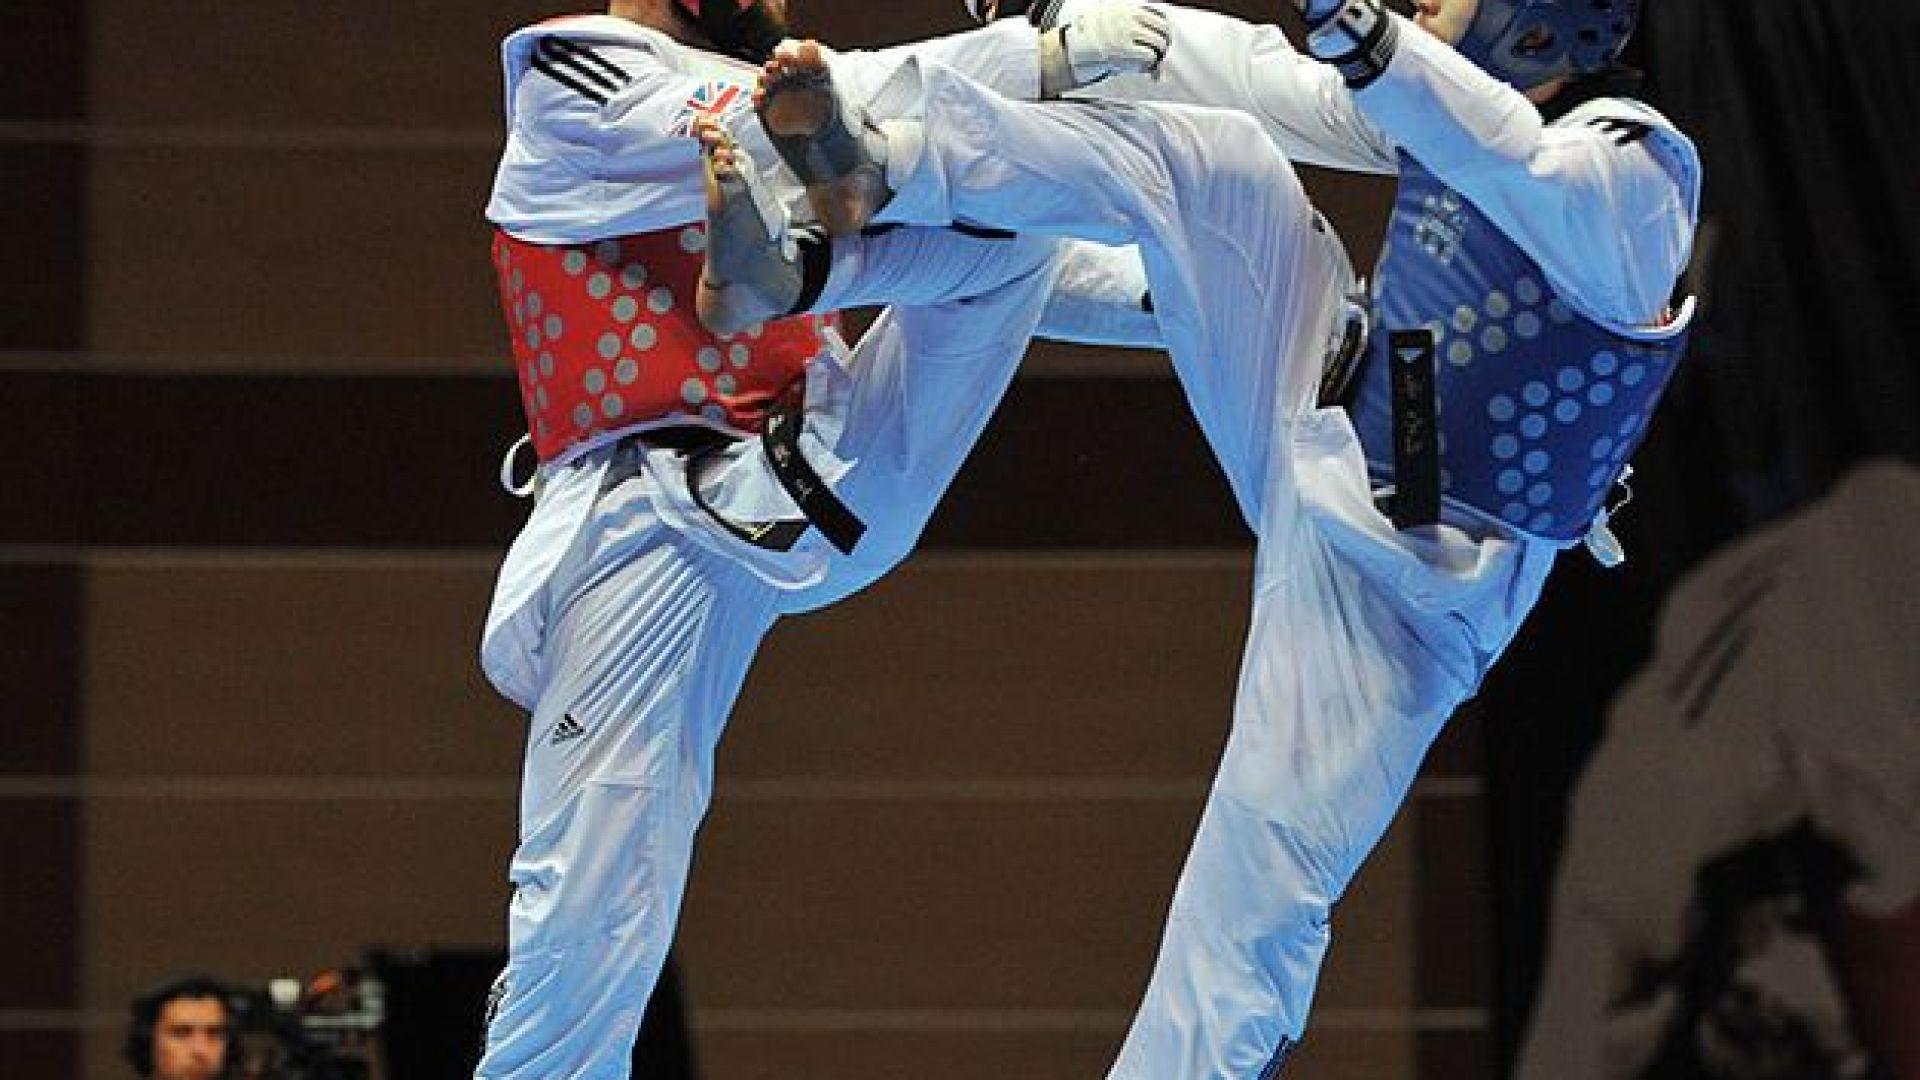 Inicia en Manchester el Mundial de Taekwondo 2019